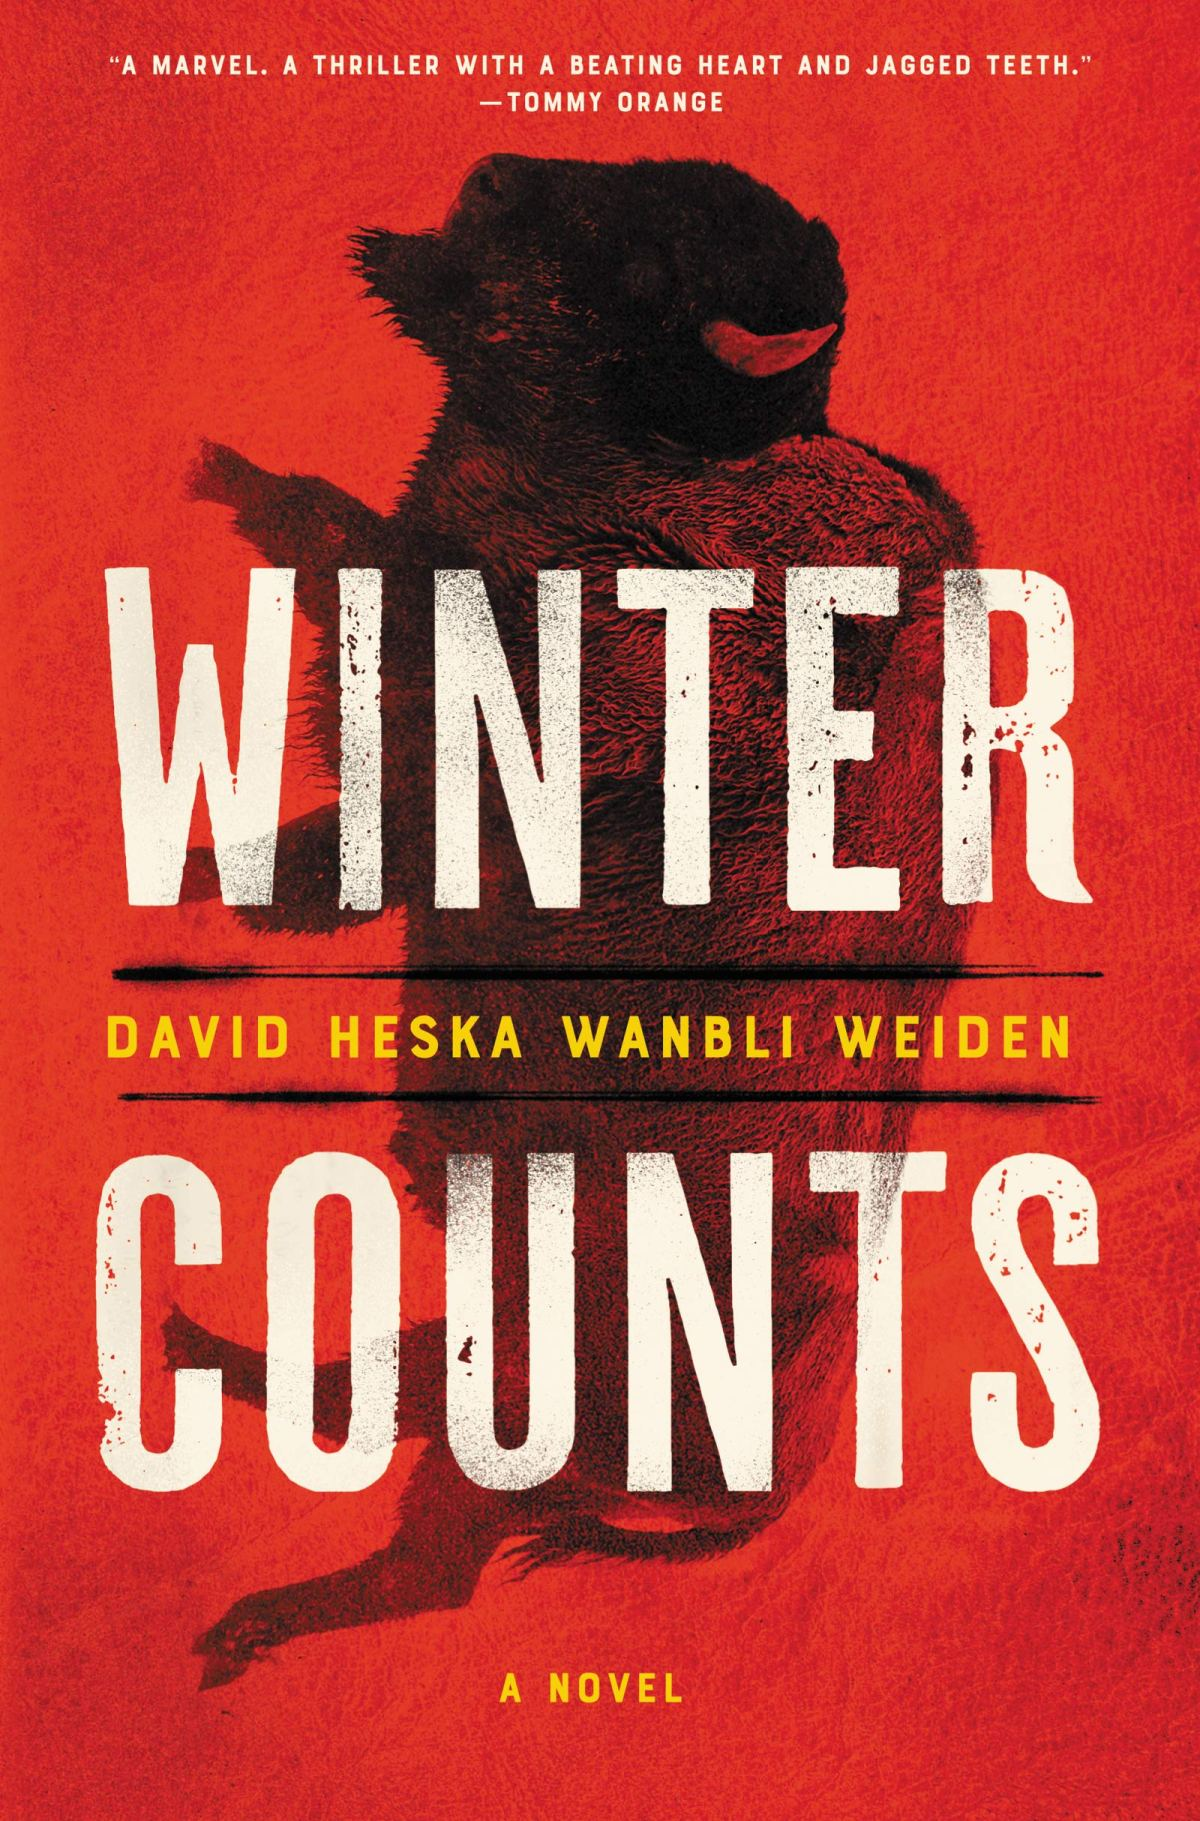 David Heska Wanbli Weiden - Winter Counts